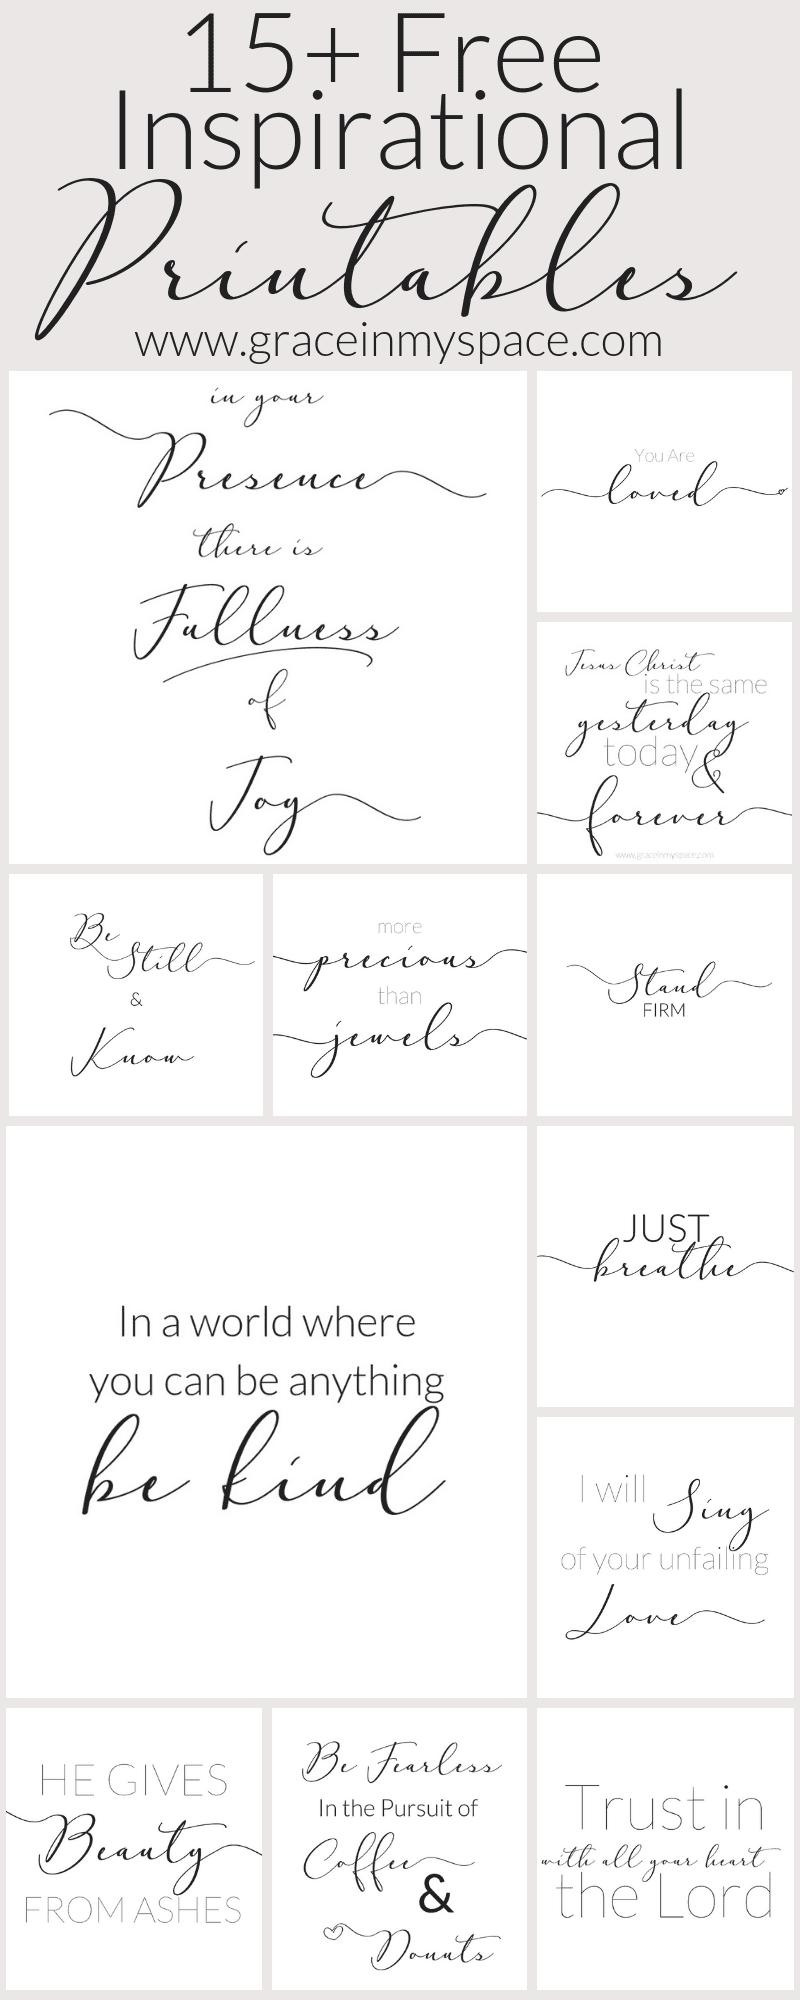 15+ Free Inspirational Printables | www.graceinmyspace.com